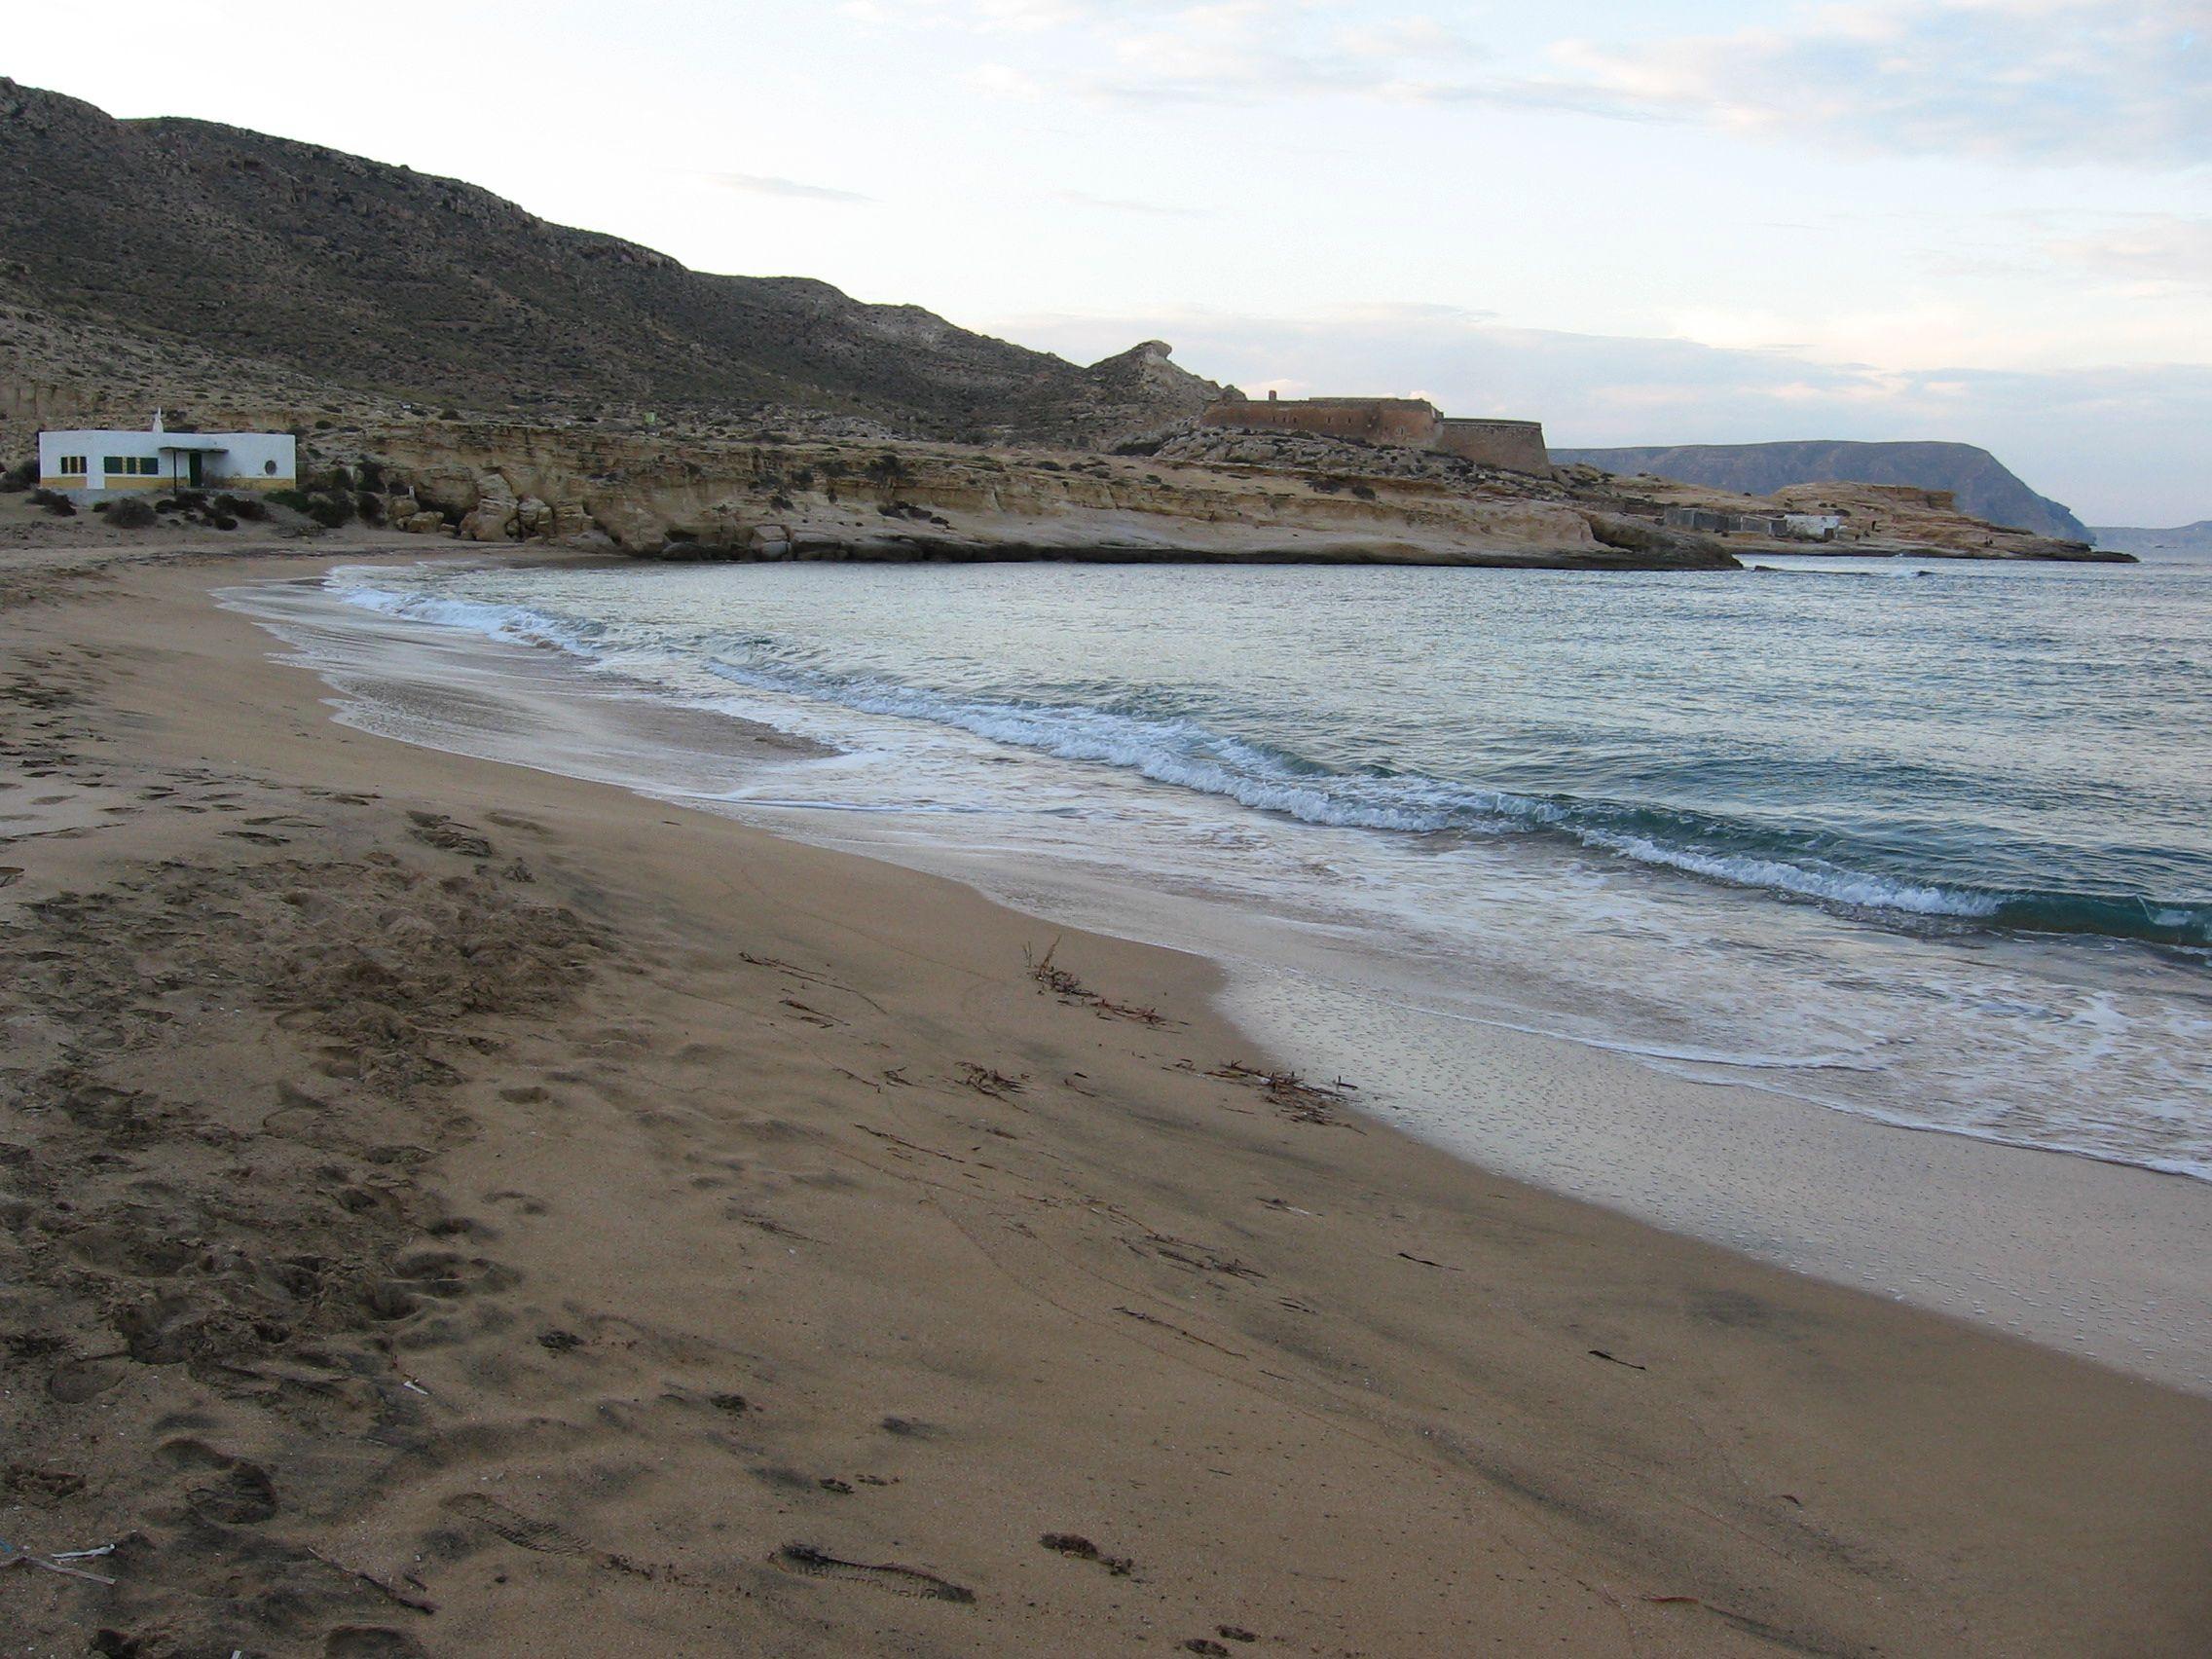 Foto playa Playazo de Rodalquilar. El Playazo